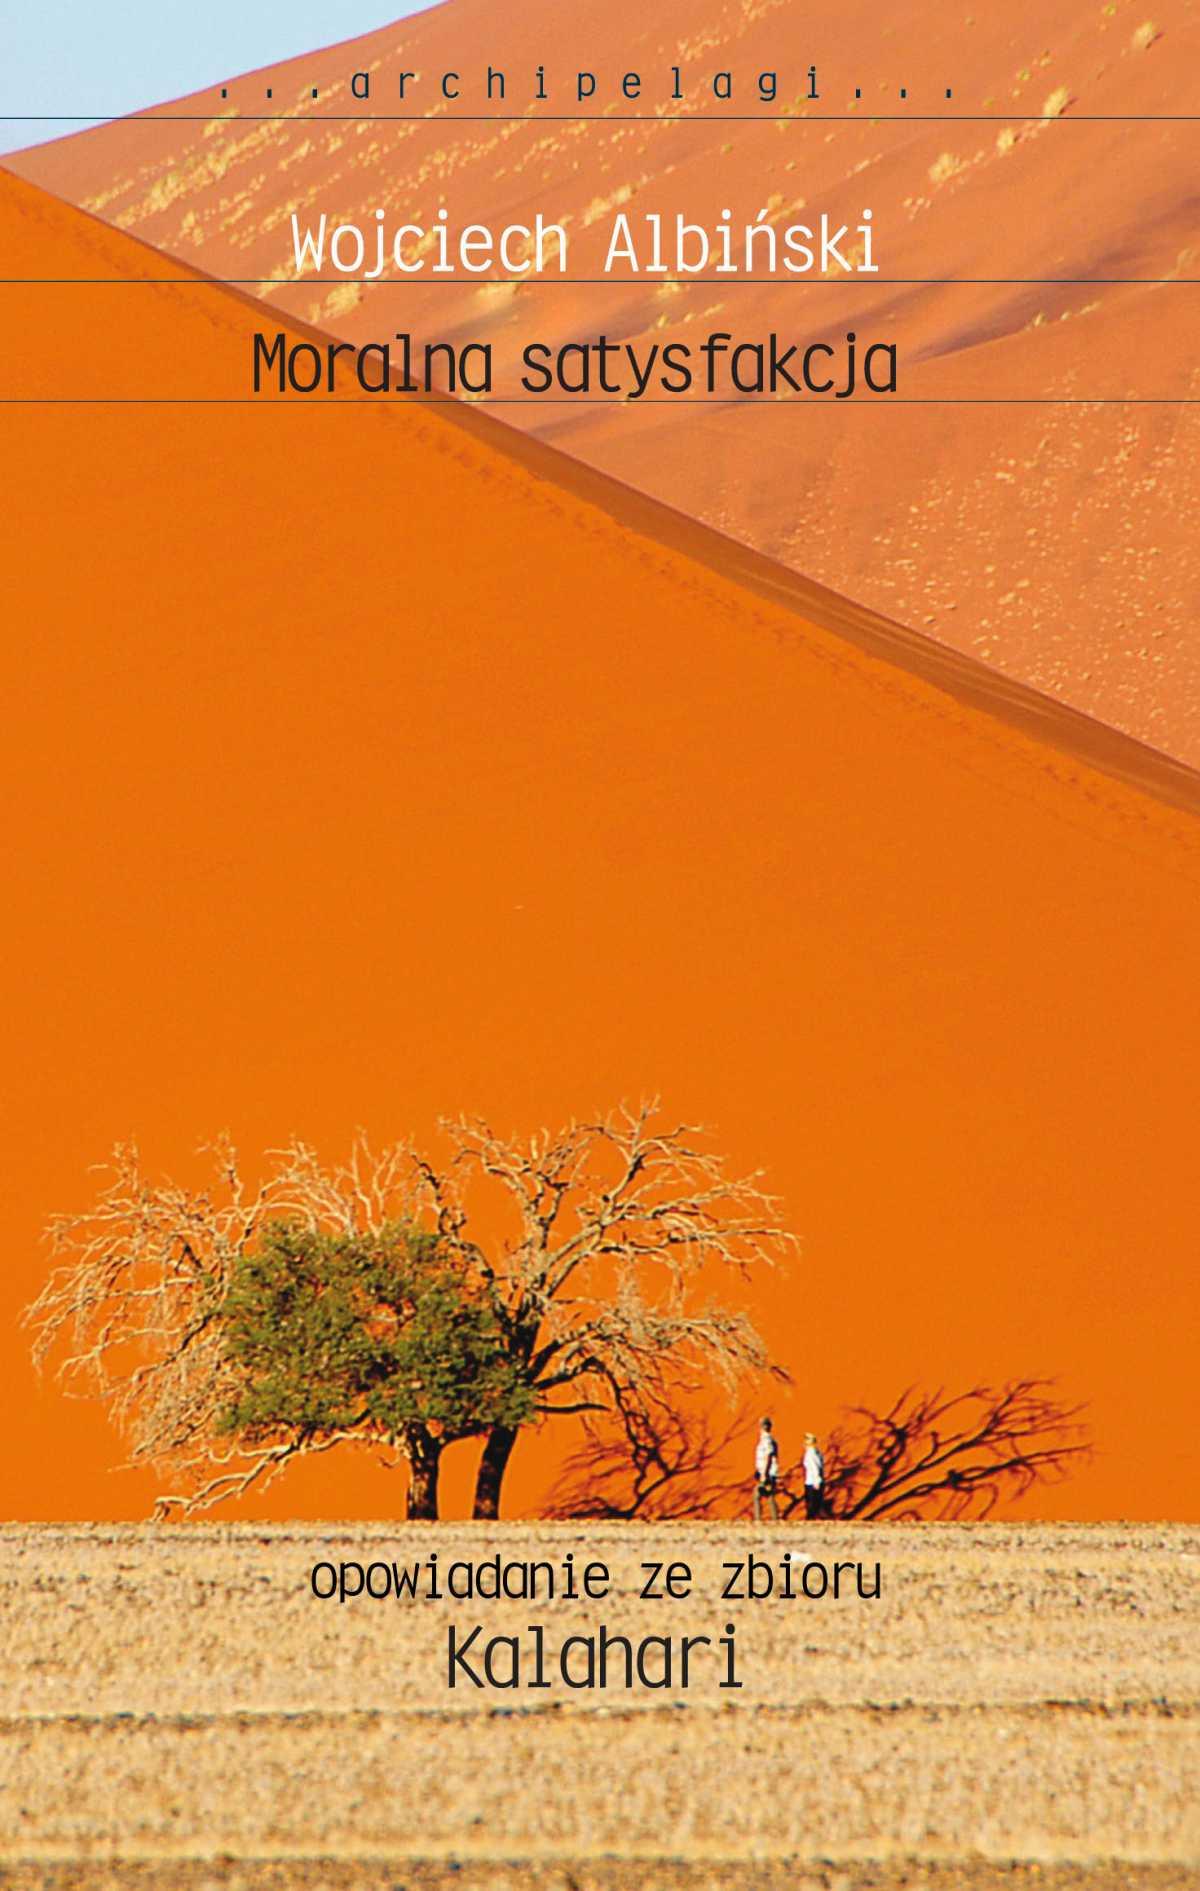 Moralna satysfakcja - Ebook (Książka na Kindle) do pobrania w formacie MOBI